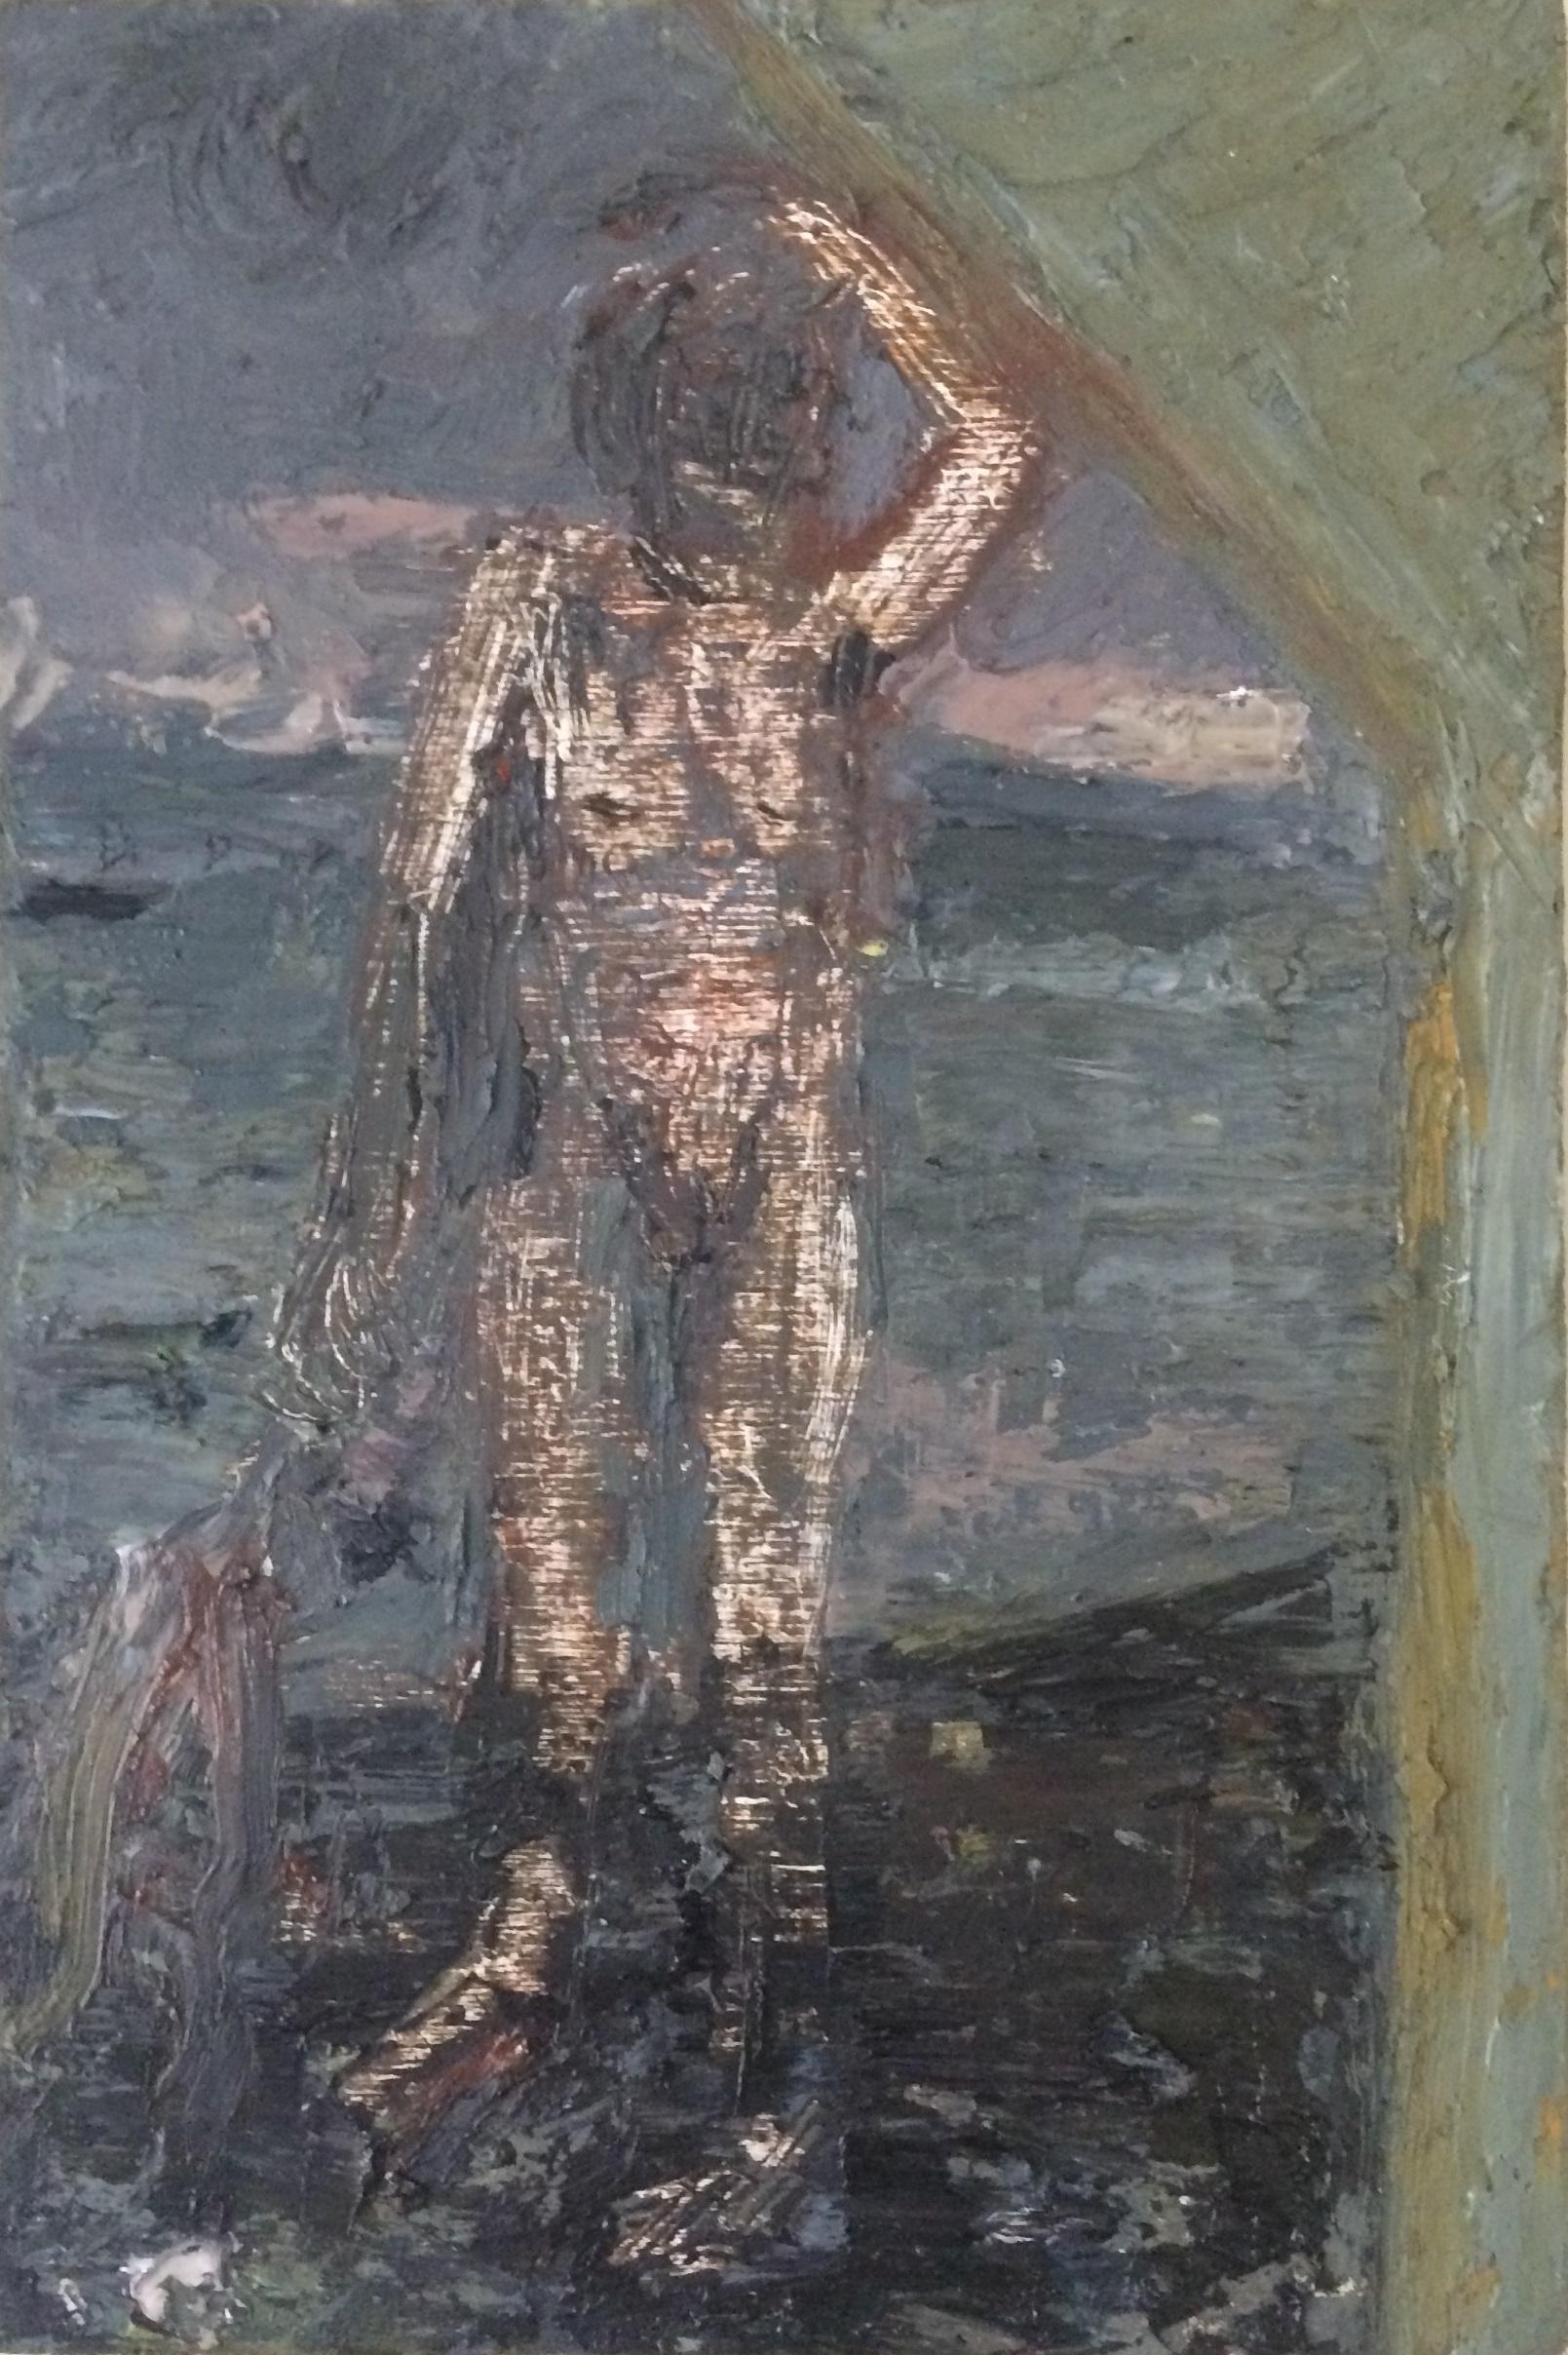 Attic, oil on panel, 2016